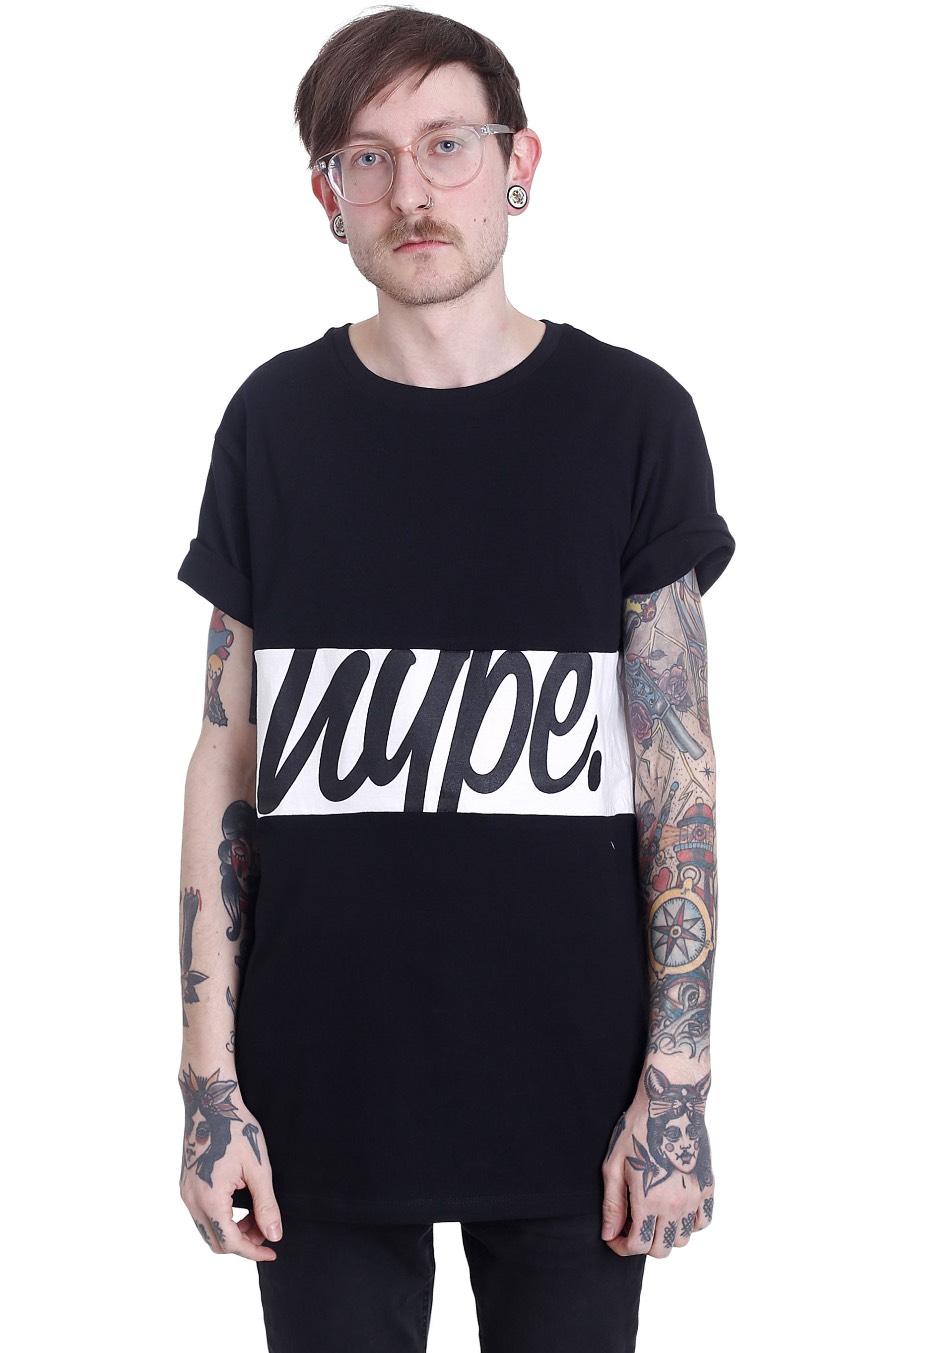 HYPE. - Infill Panel Black White - Tričko - Streetwear obchod ... 55c4e55cb1